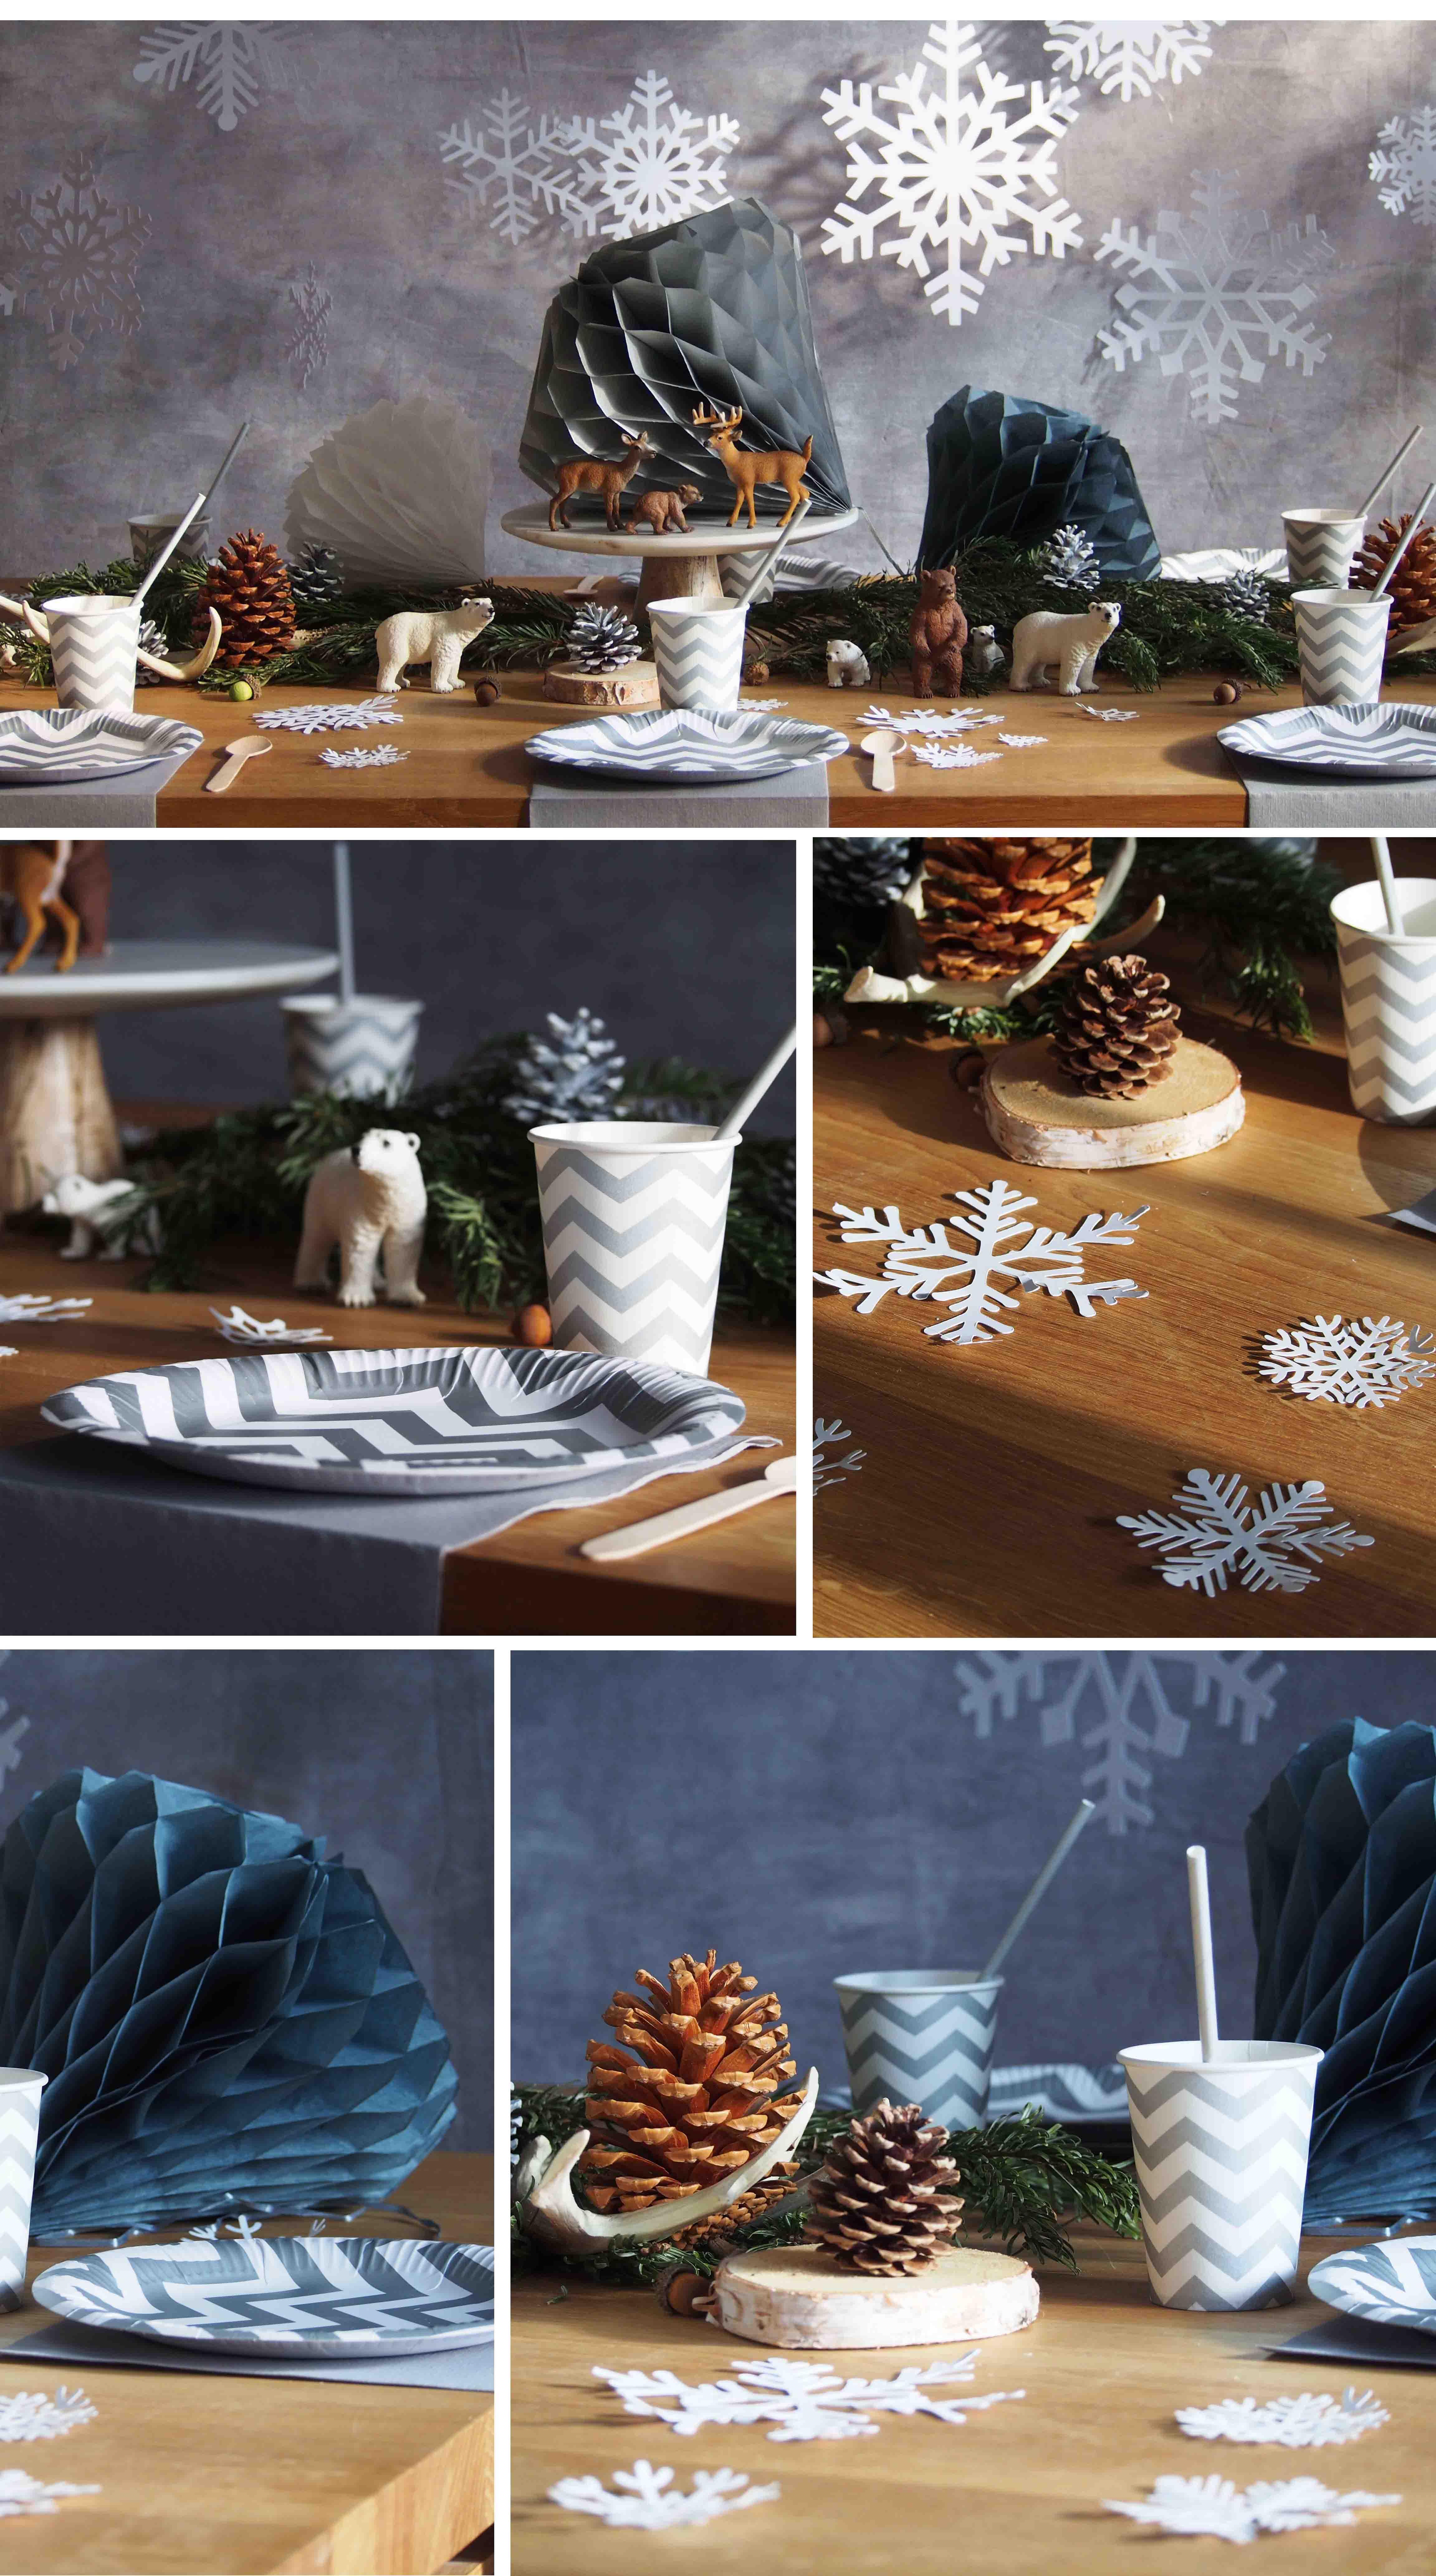 un anniversaire reine des neiges rose caramelle carnet d 39 inspiration. Black Bedroom Furniture Sets. Home Design Ideas